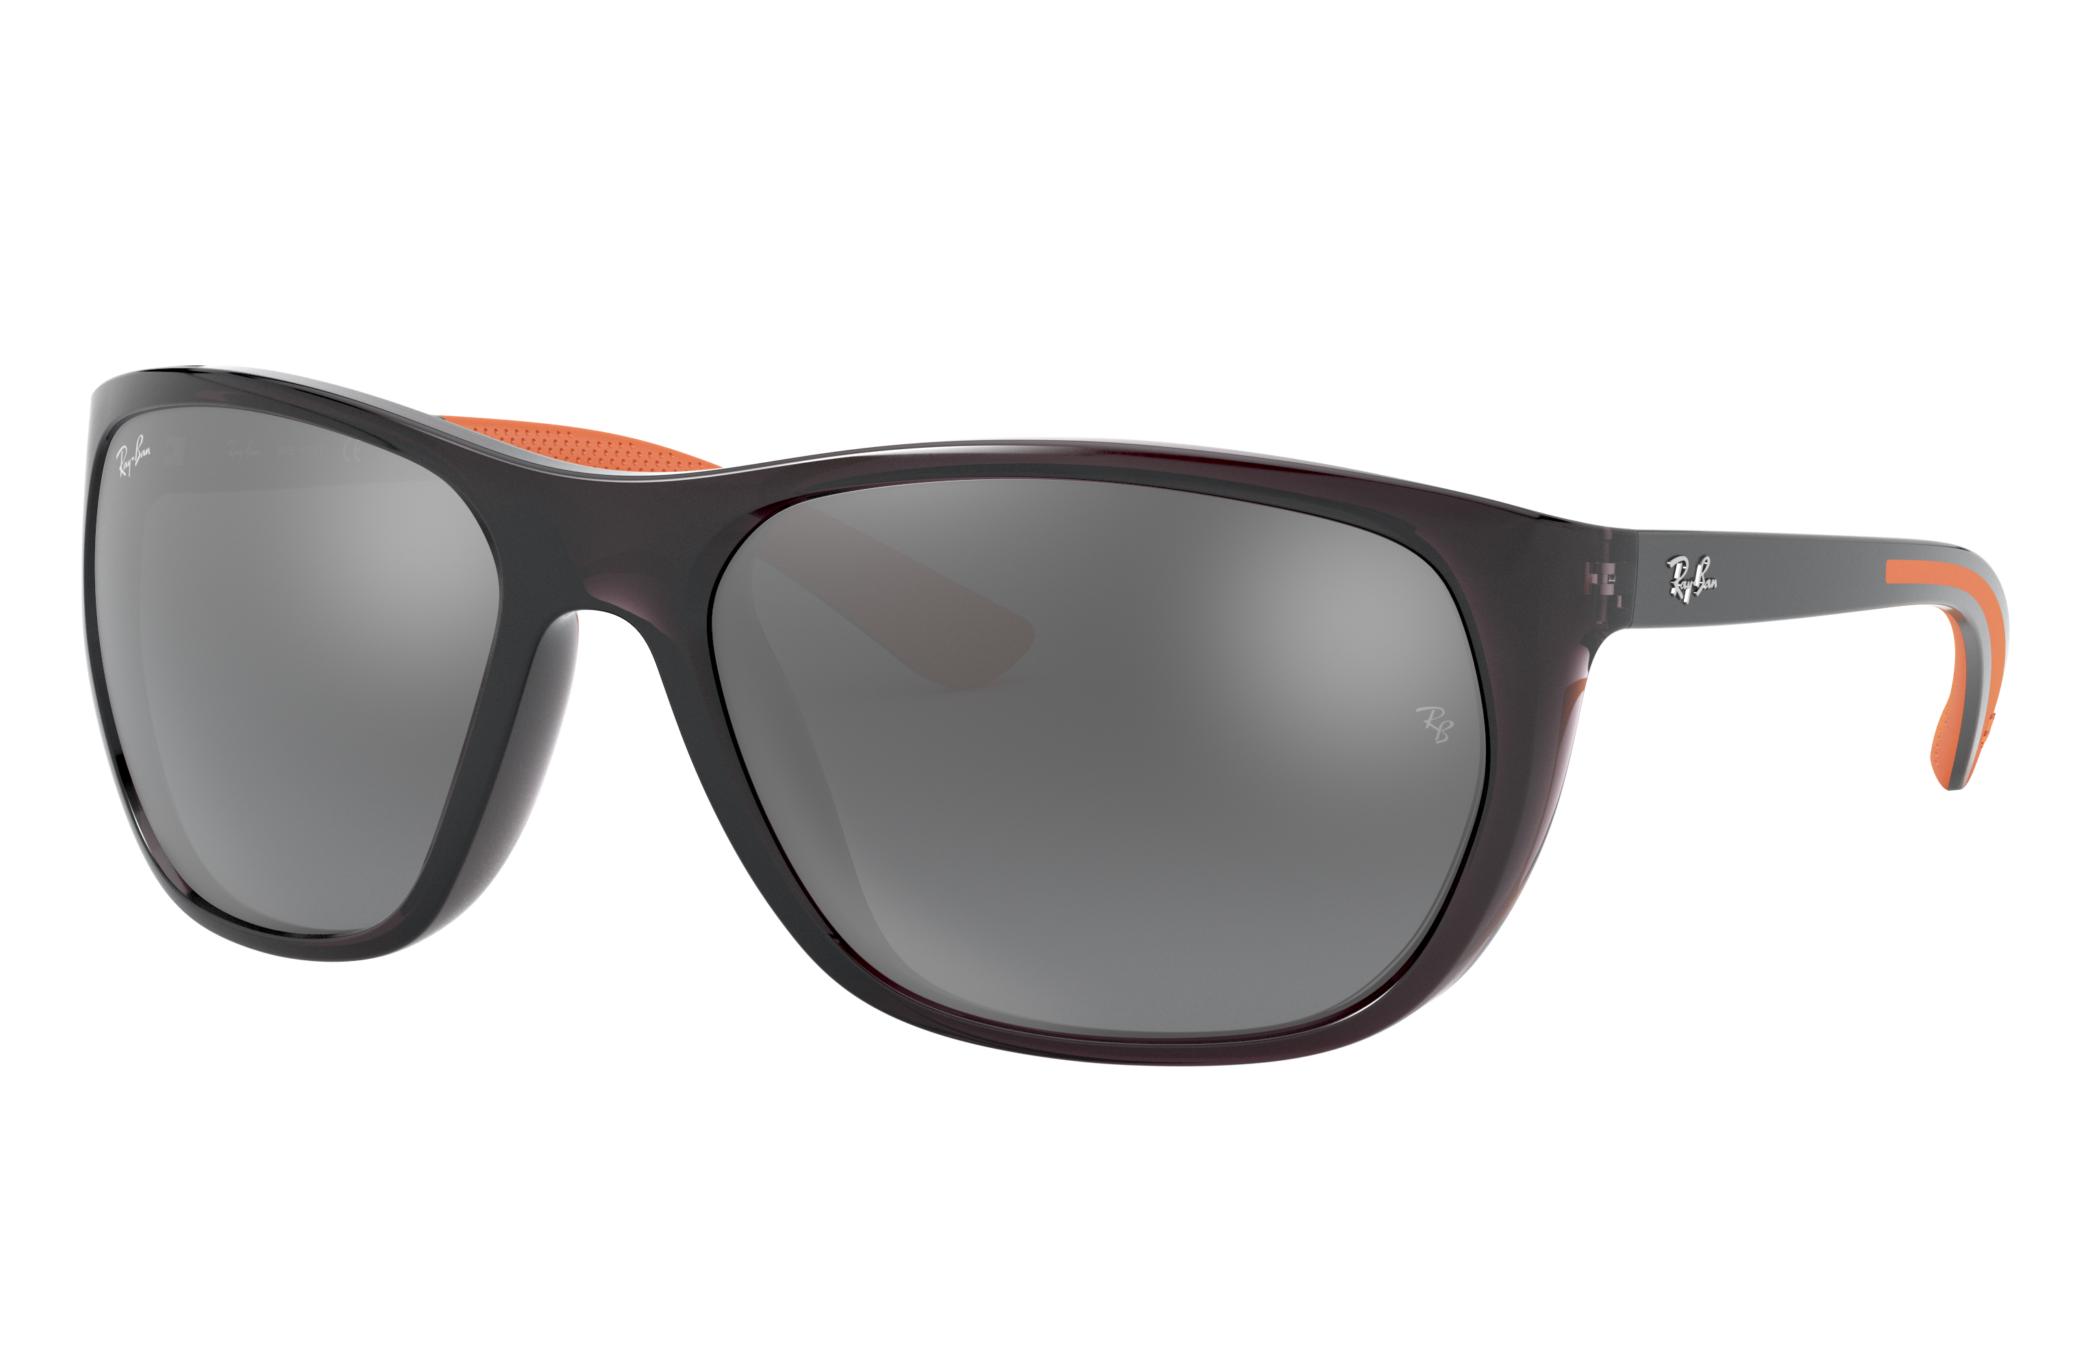 Ray-Ban Rb4307 Grey, Gray Lenses - RB4307